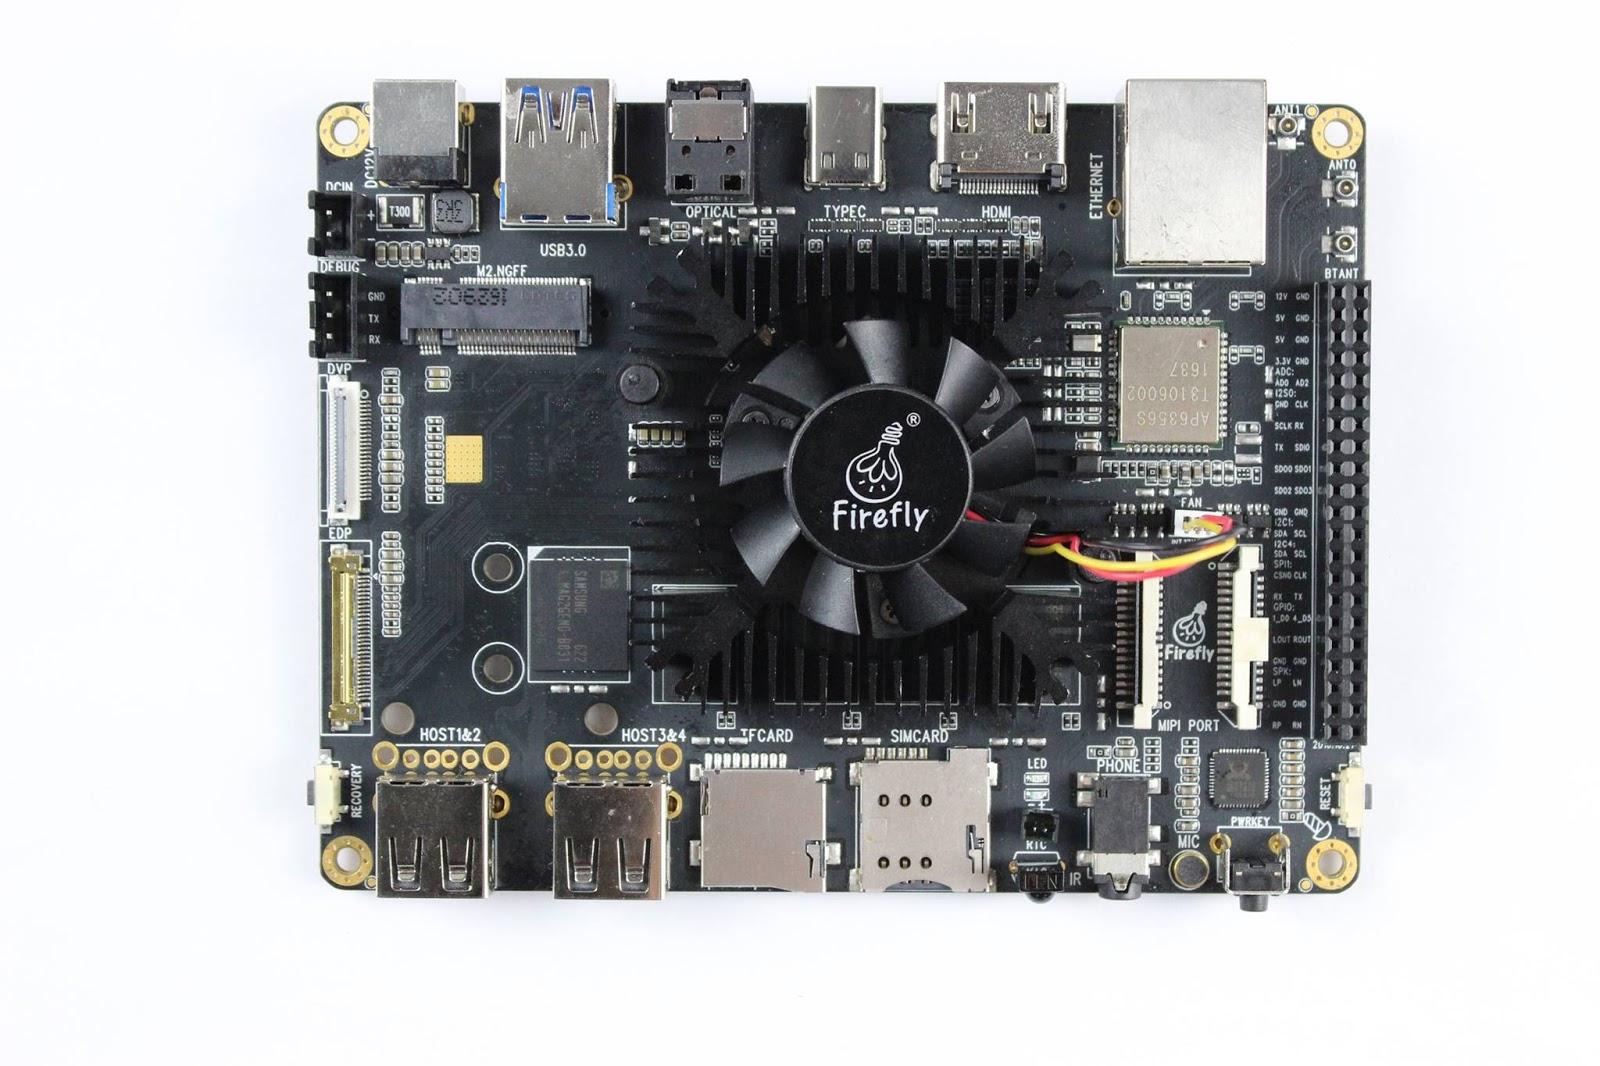 Firefly-RK3399 armv8 64 Bit development board running MaliT860 GPU